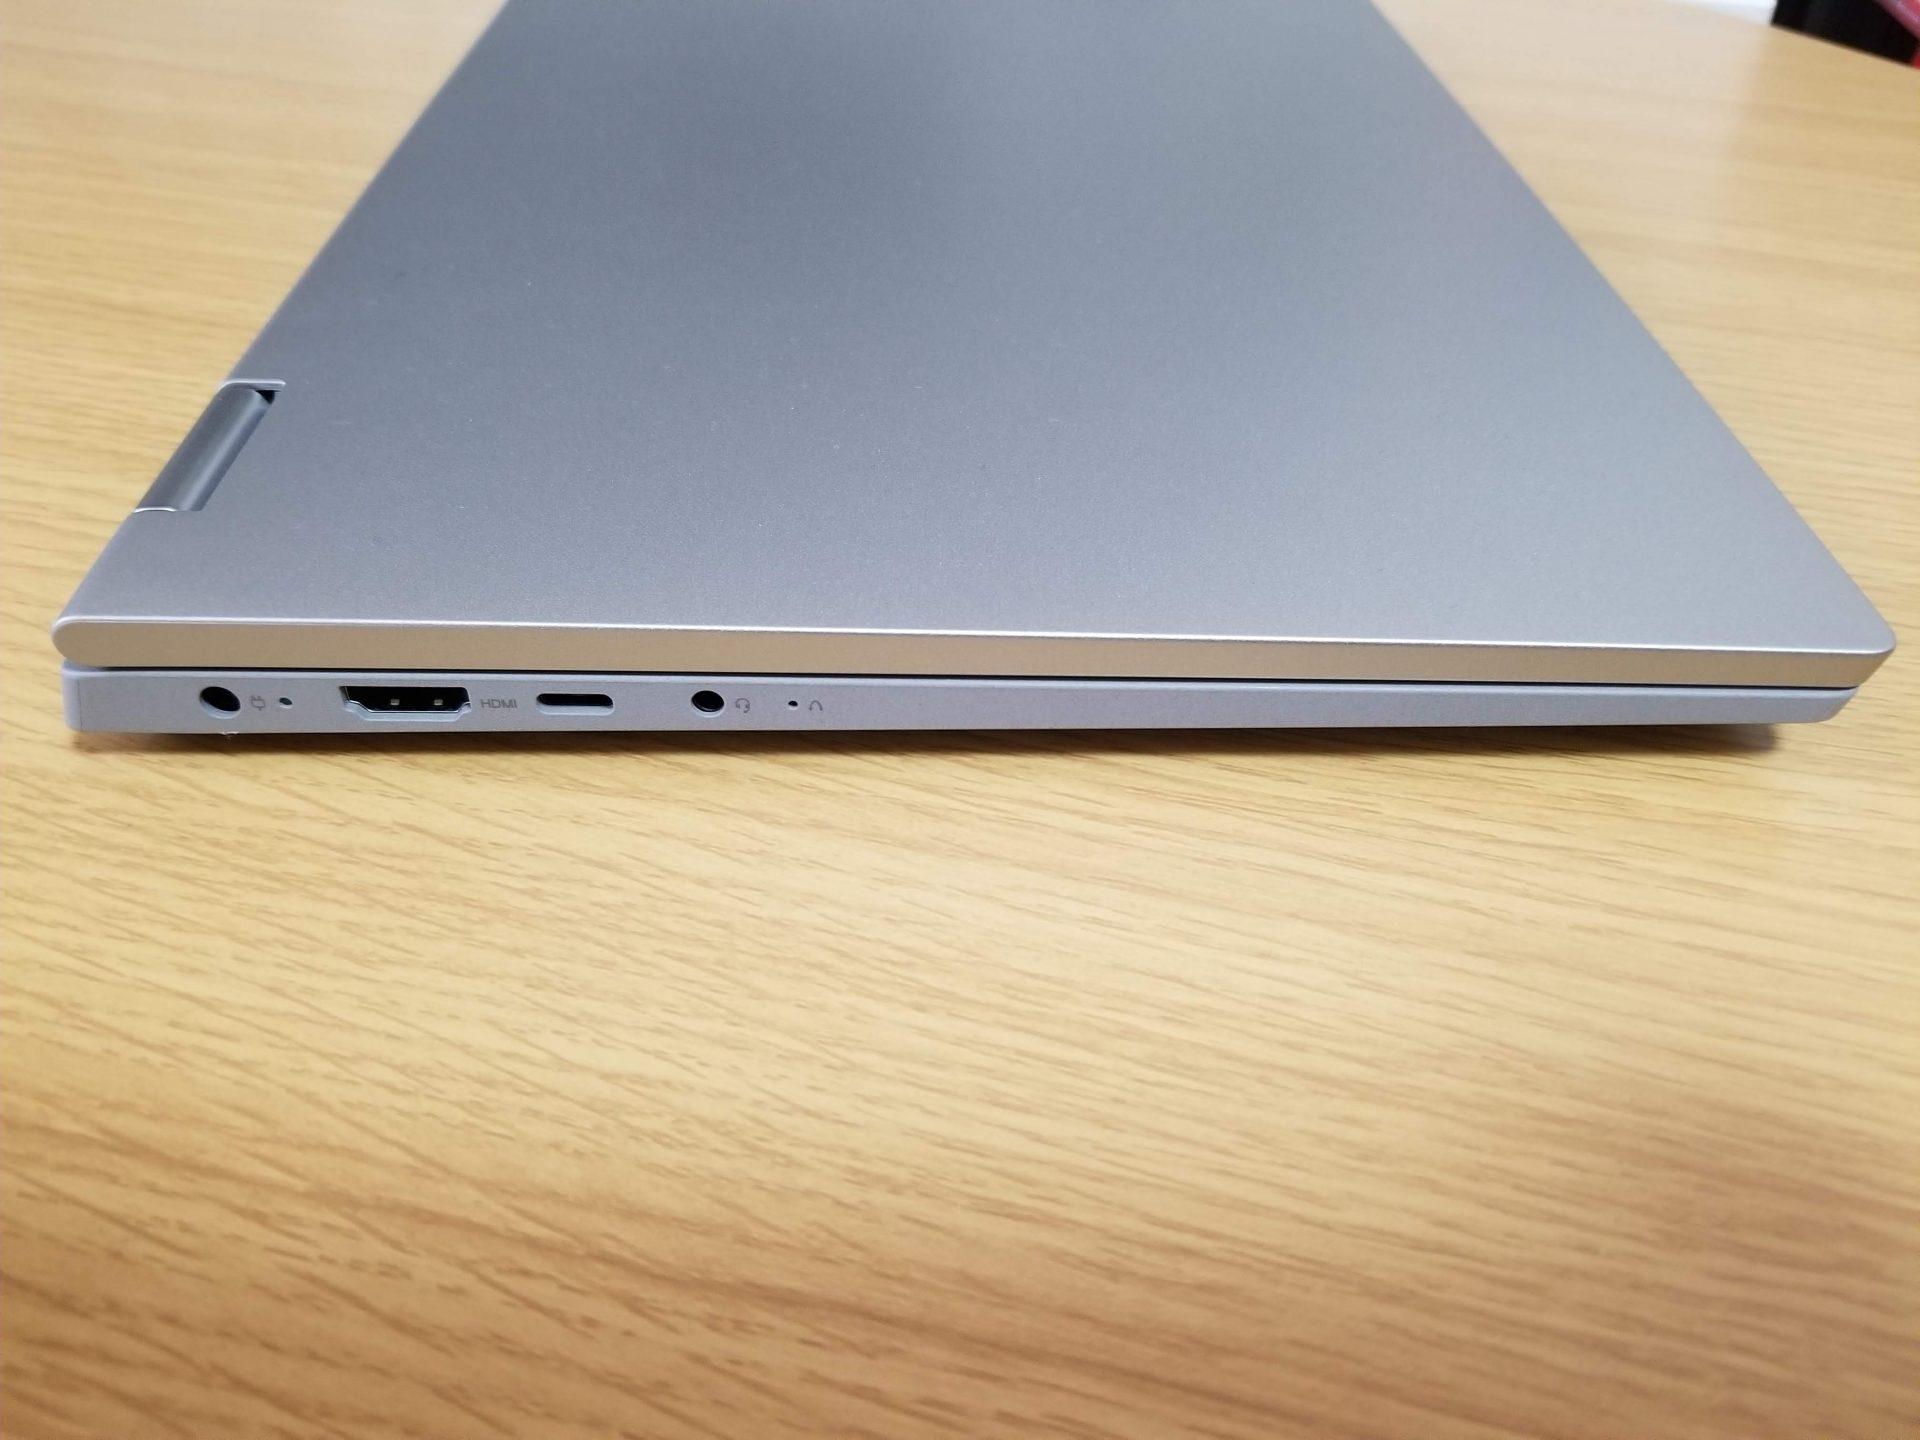 IdeaPad Flex 550(14)はUSB Type Cでも充電可能